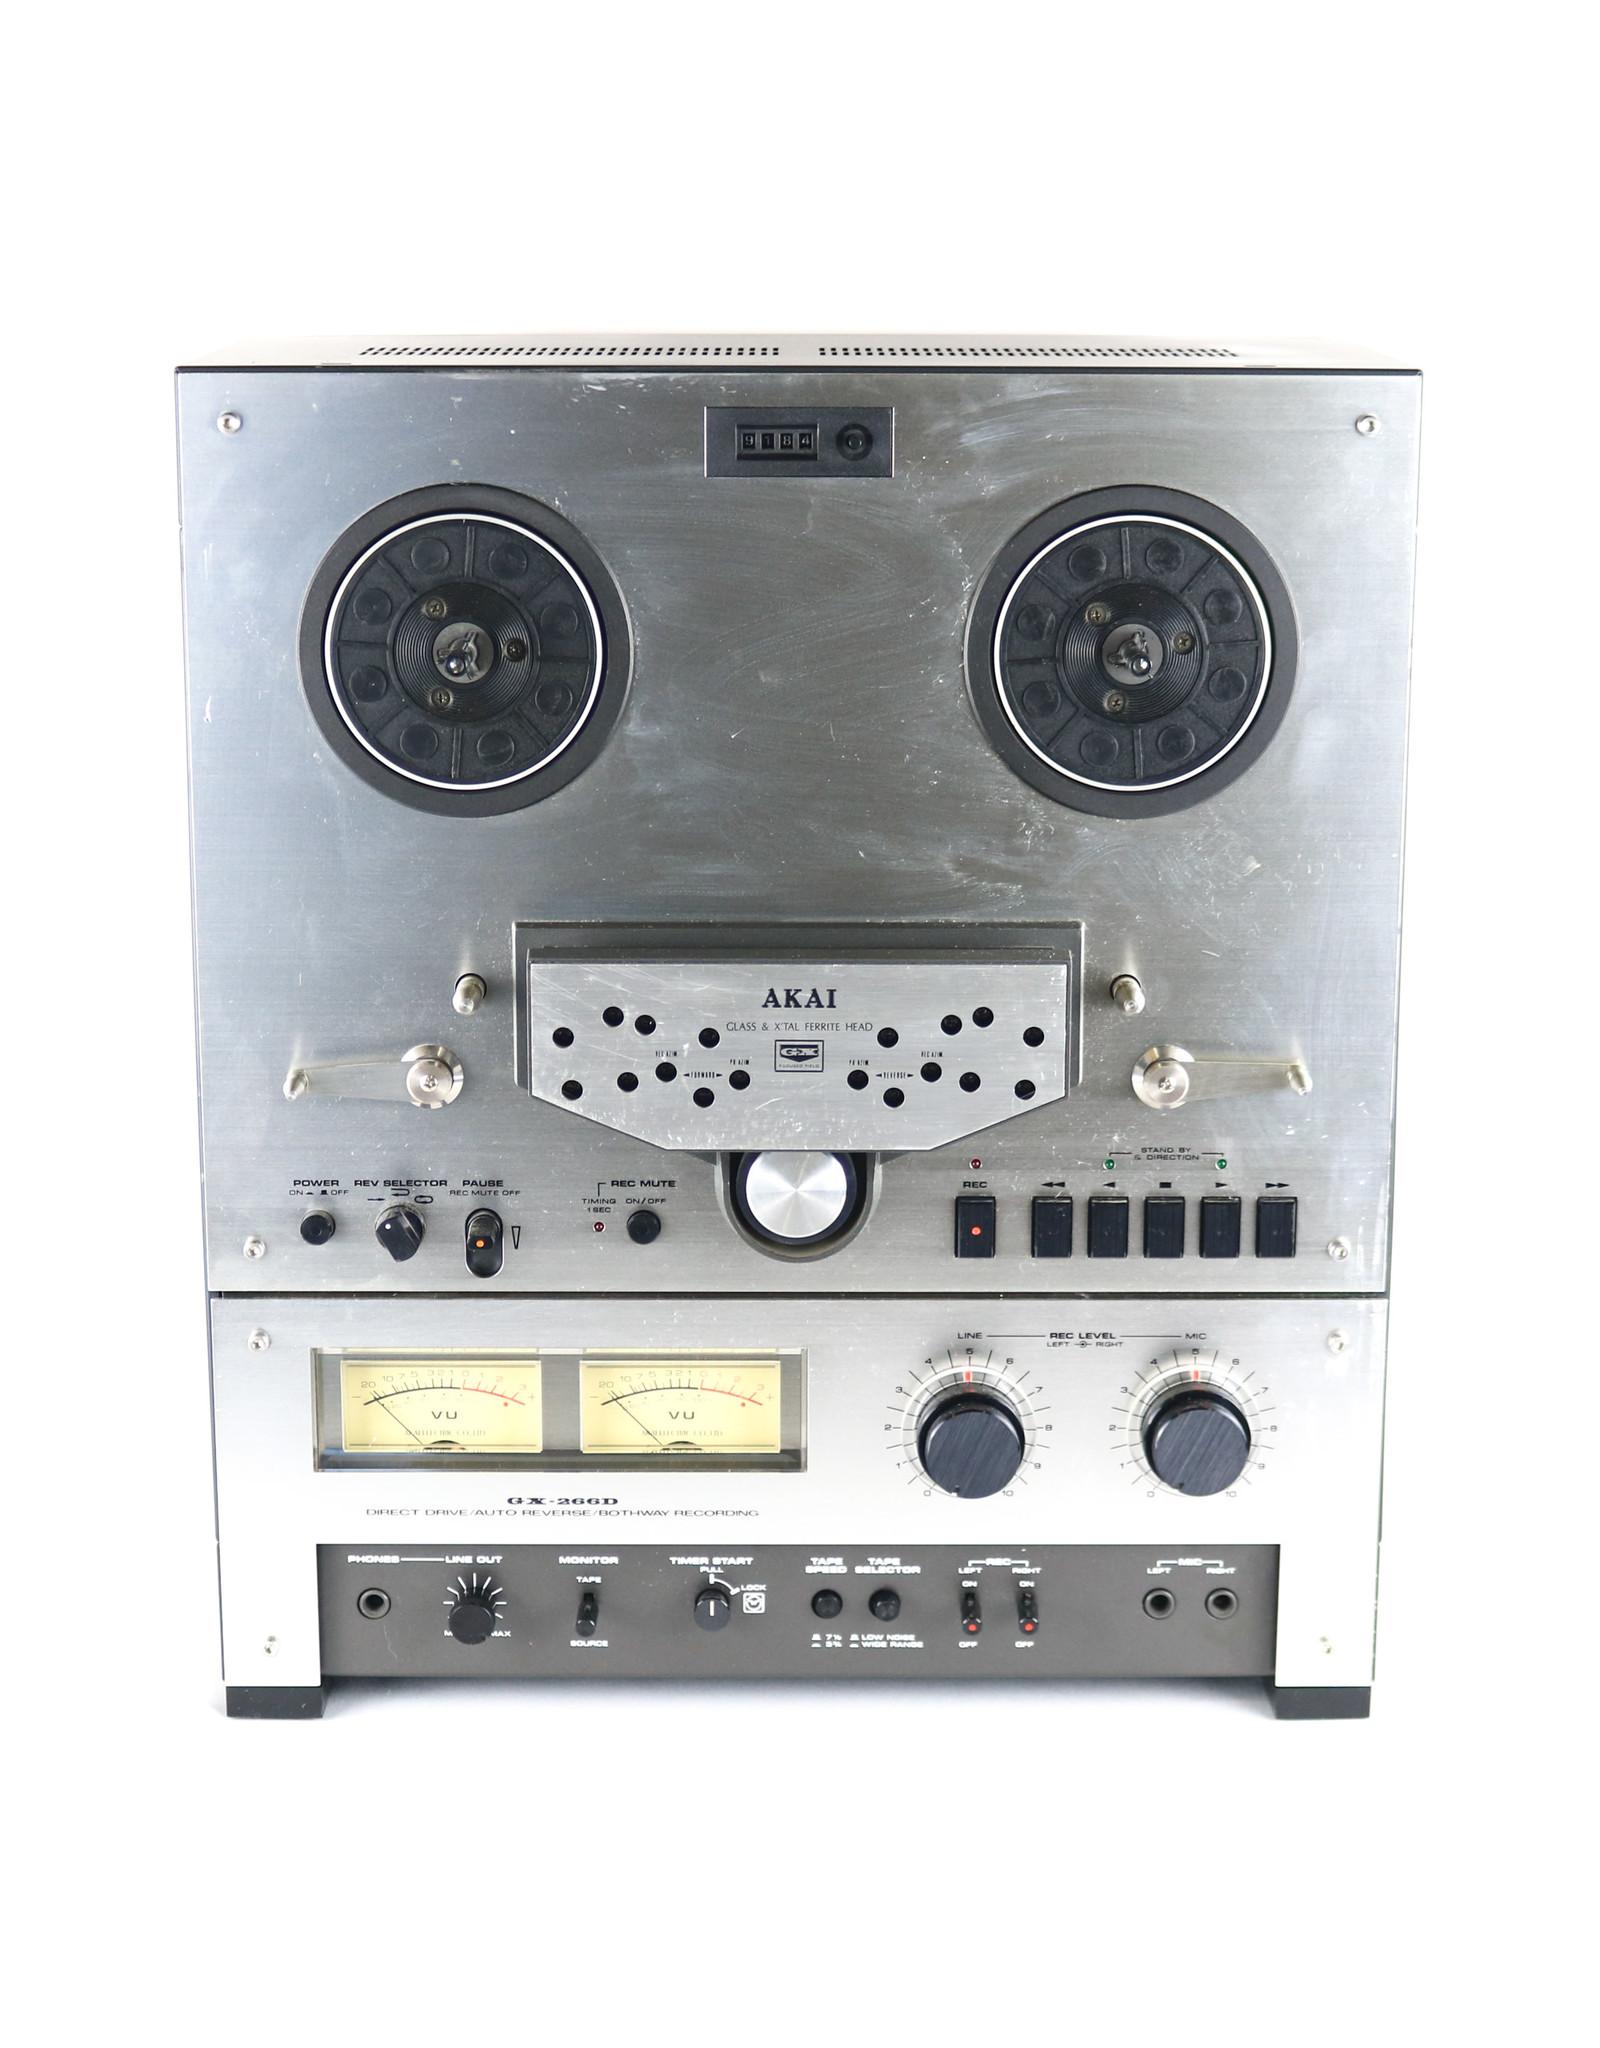 Akai Akai GX-266D Reel-To-Reel Deck USED